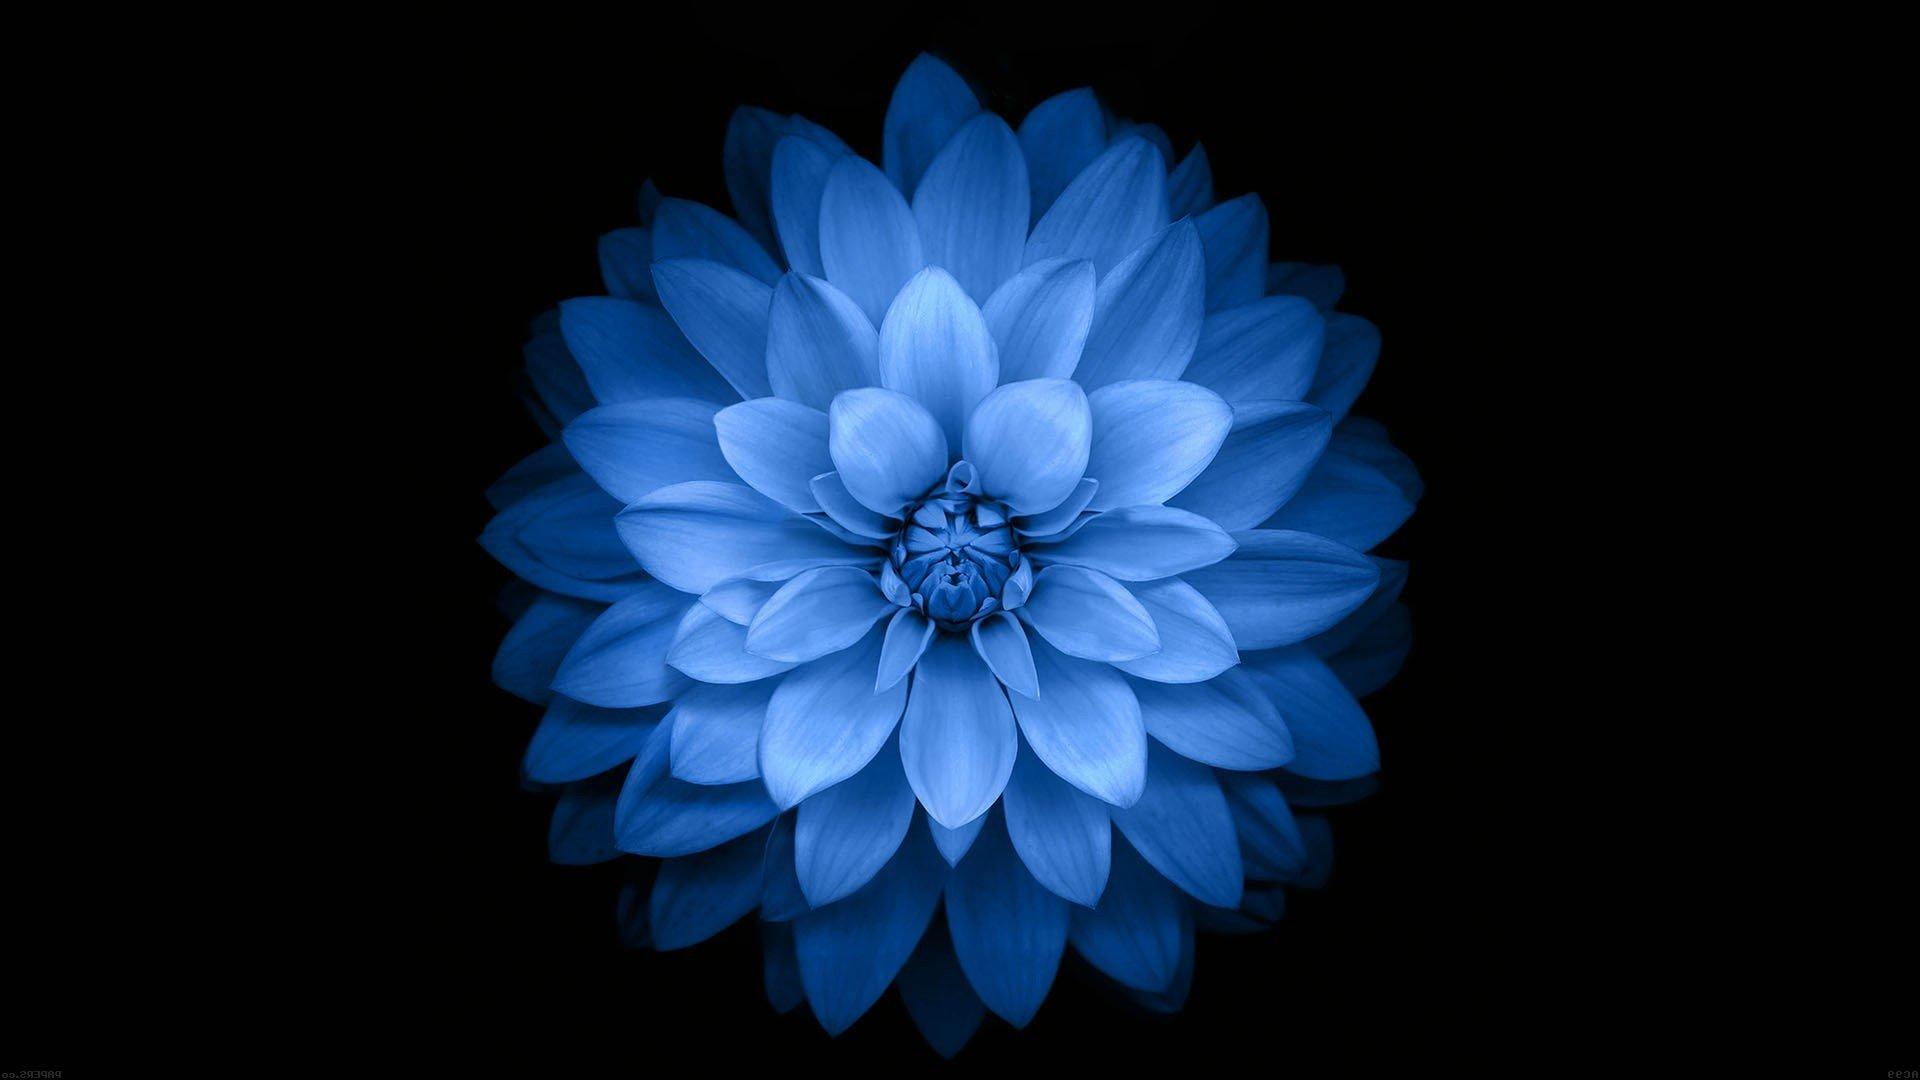 Blue Flower Wallpapers 1920x1080 Full Hd 1080p Desktop Backgrounds